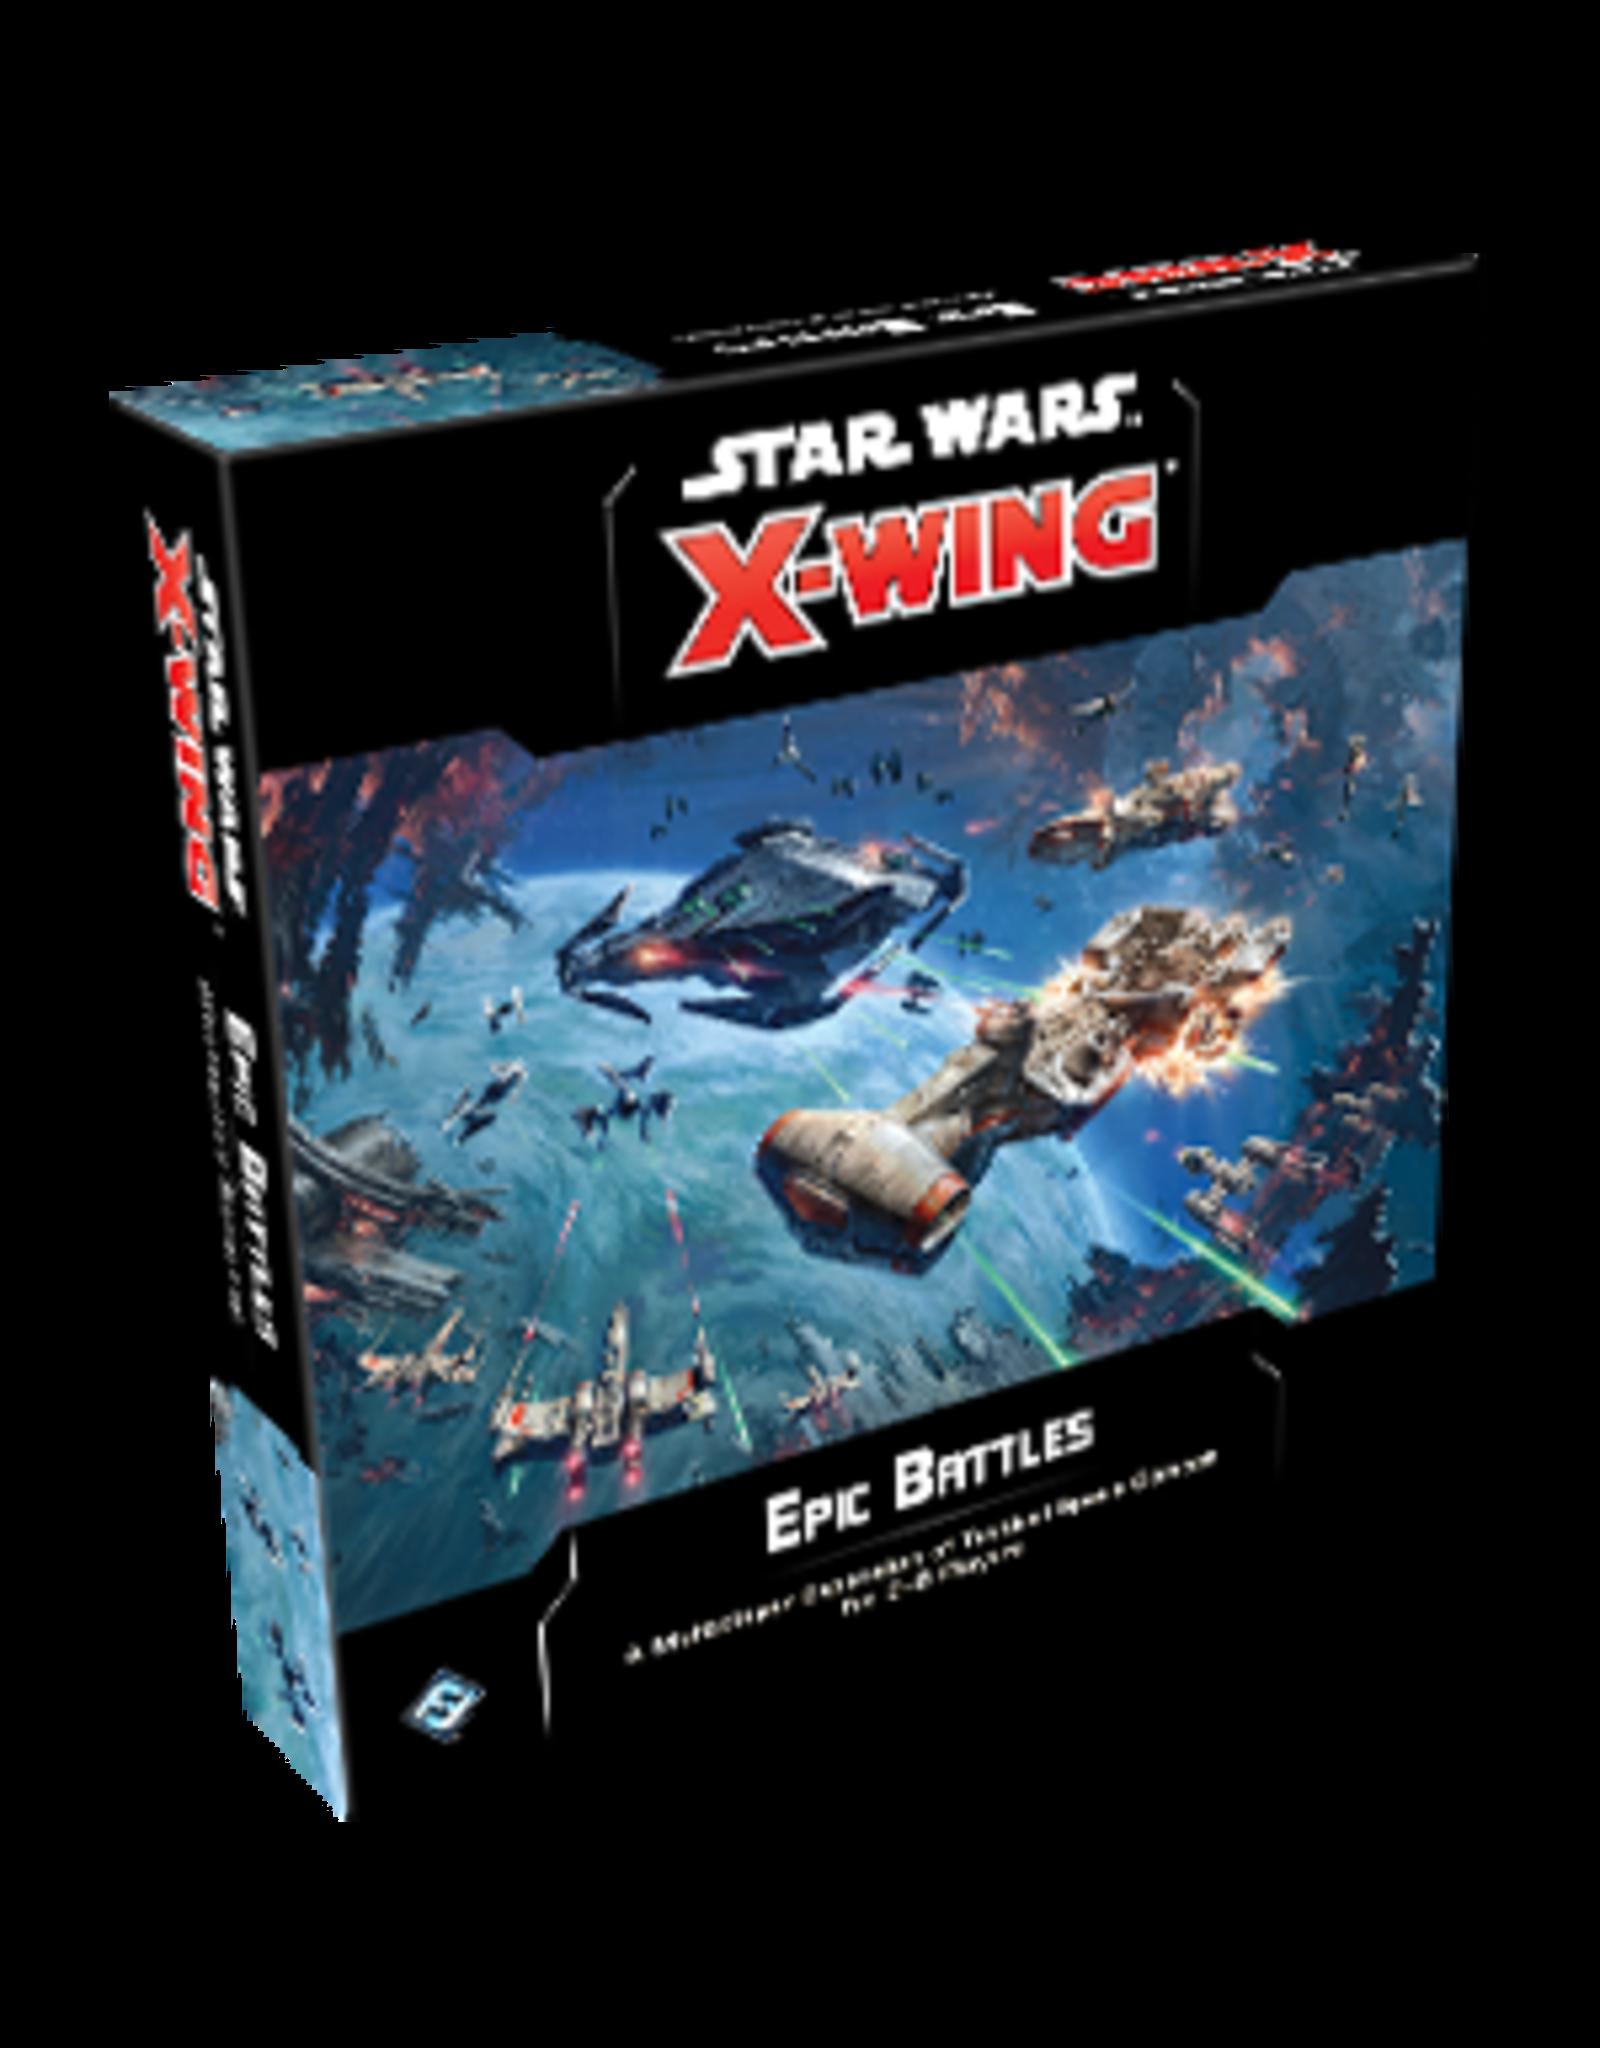 Fantasy Flight Games Star Wars X-wing 2E: Epic Battles Multiplayer Expansion